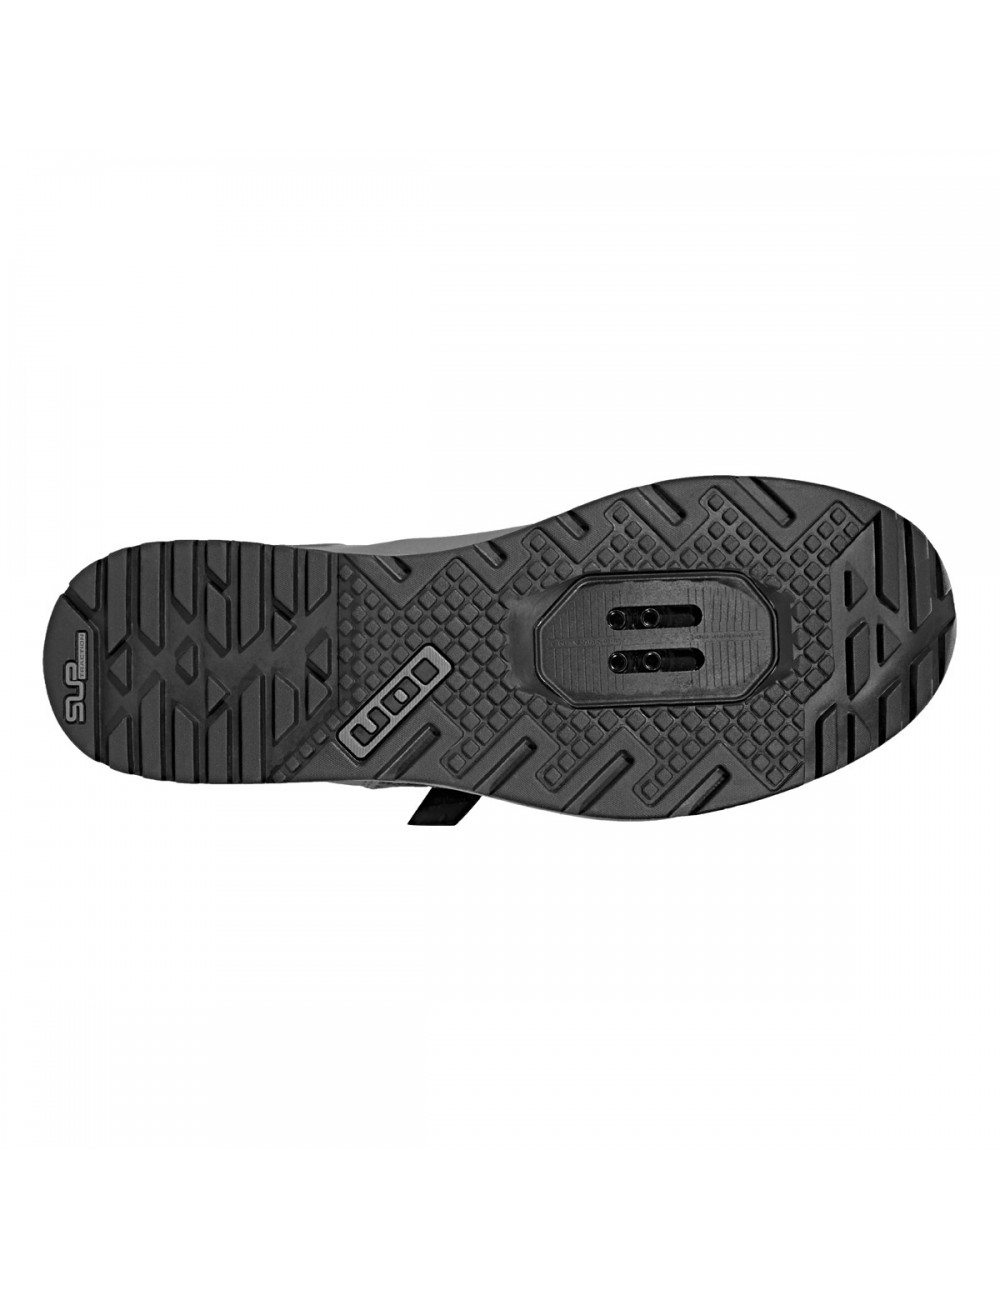 ION Rascal Shoe - Black_11974